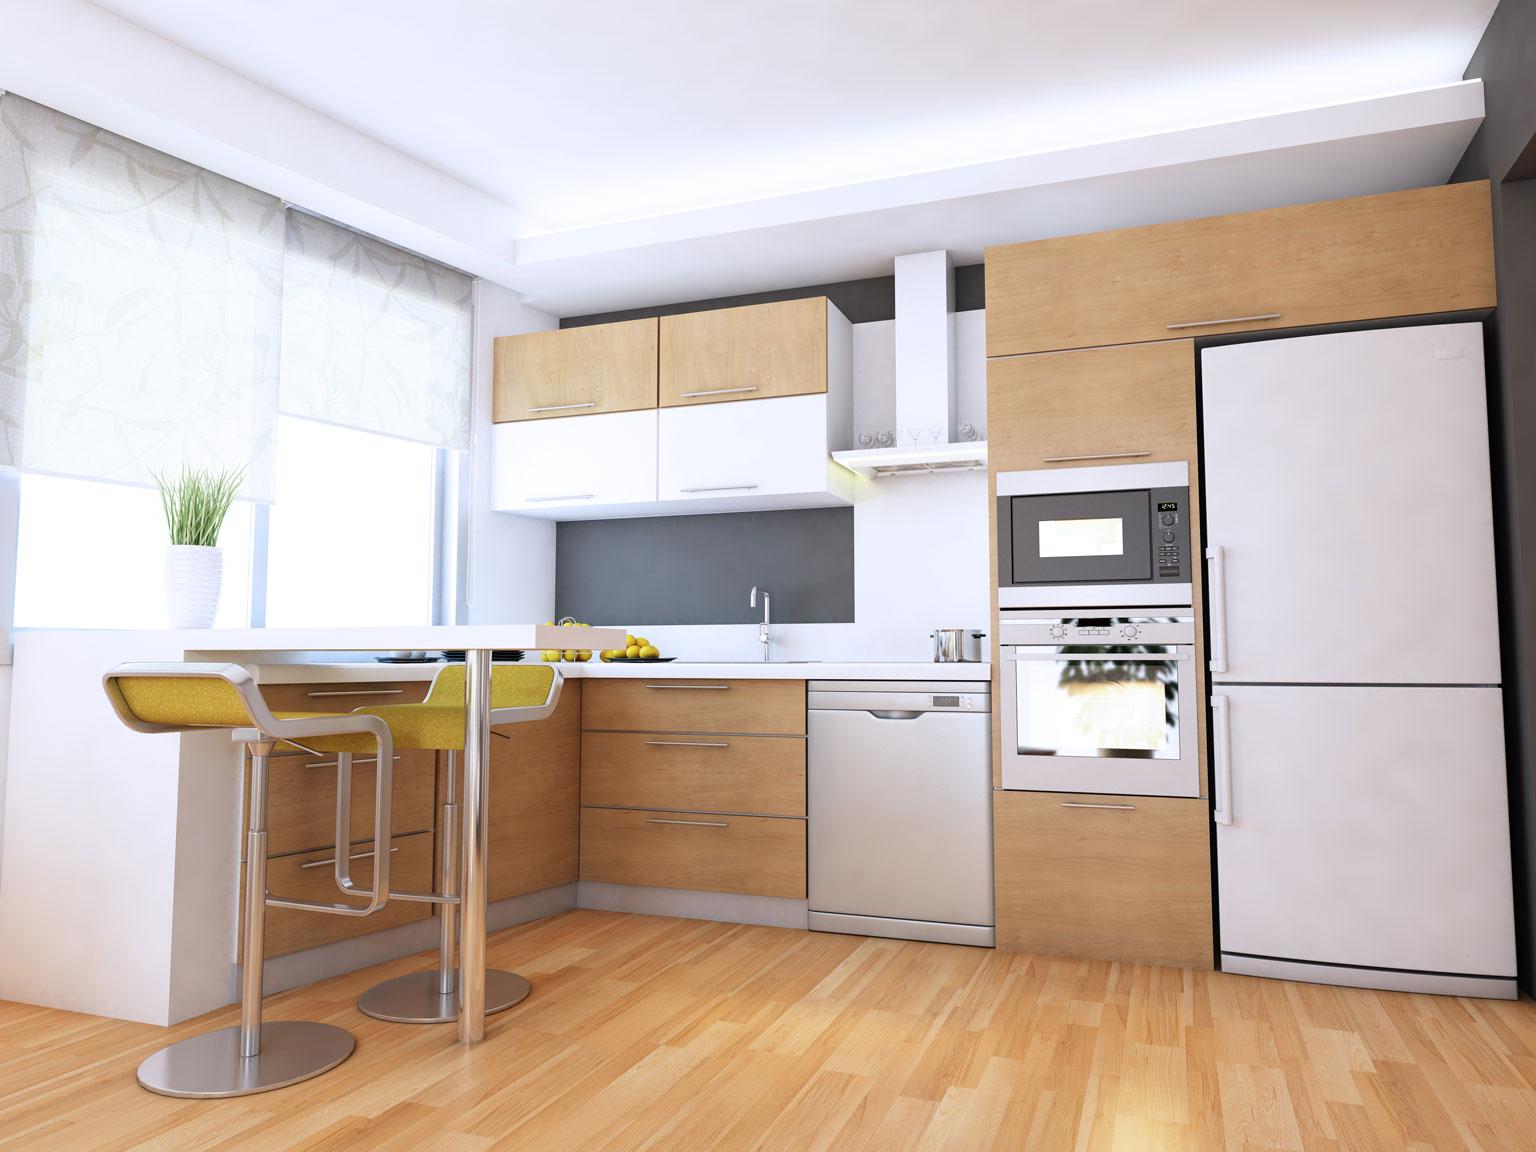 Custom Laminate Cabinets 187 Komponents Laminated Products Inc